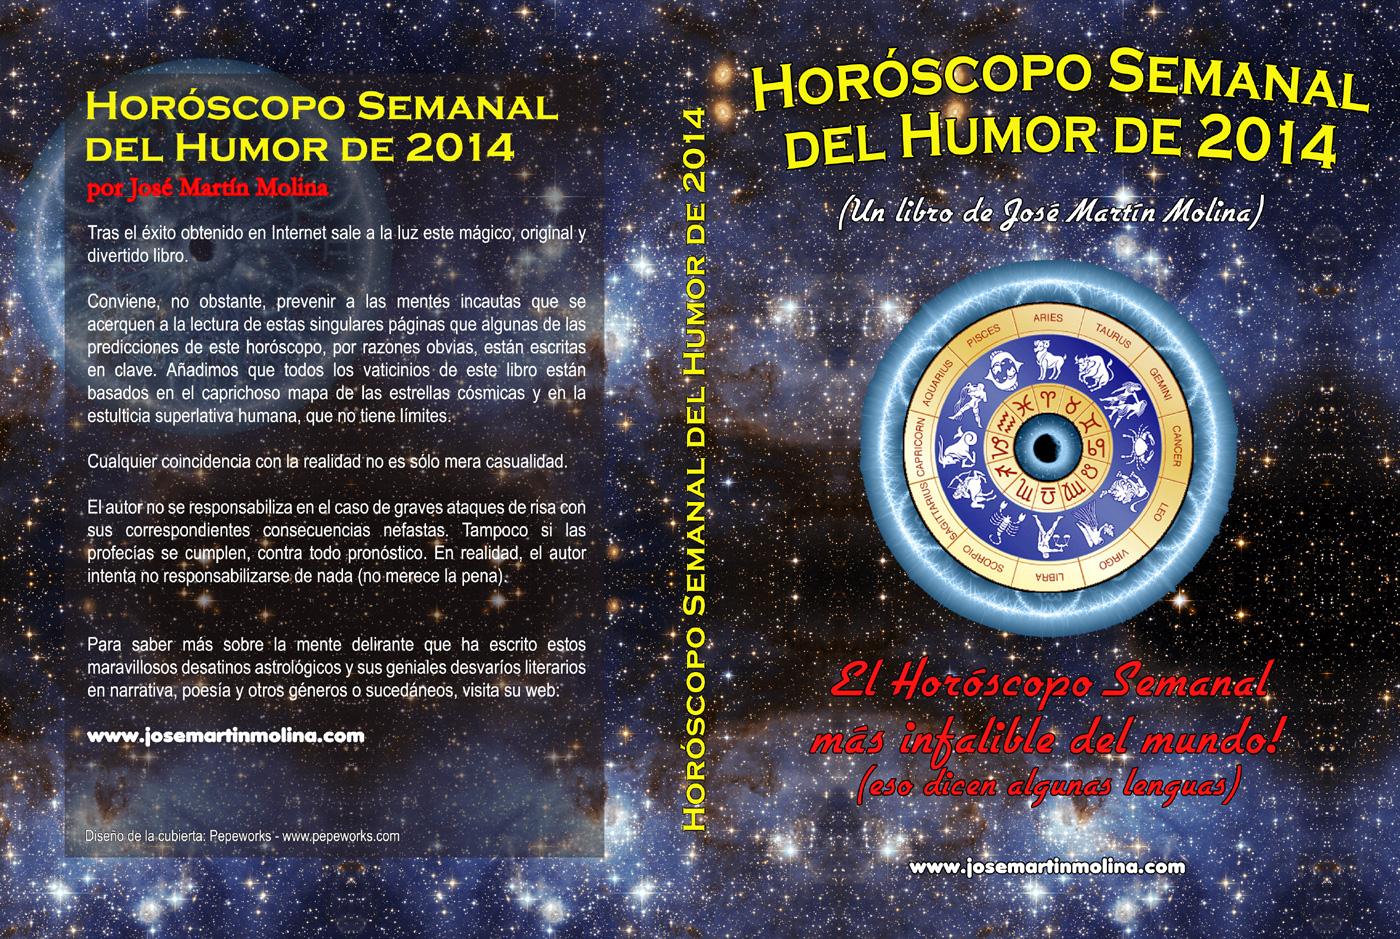 cubierta-horoscopo-semanal-del-humor-2014